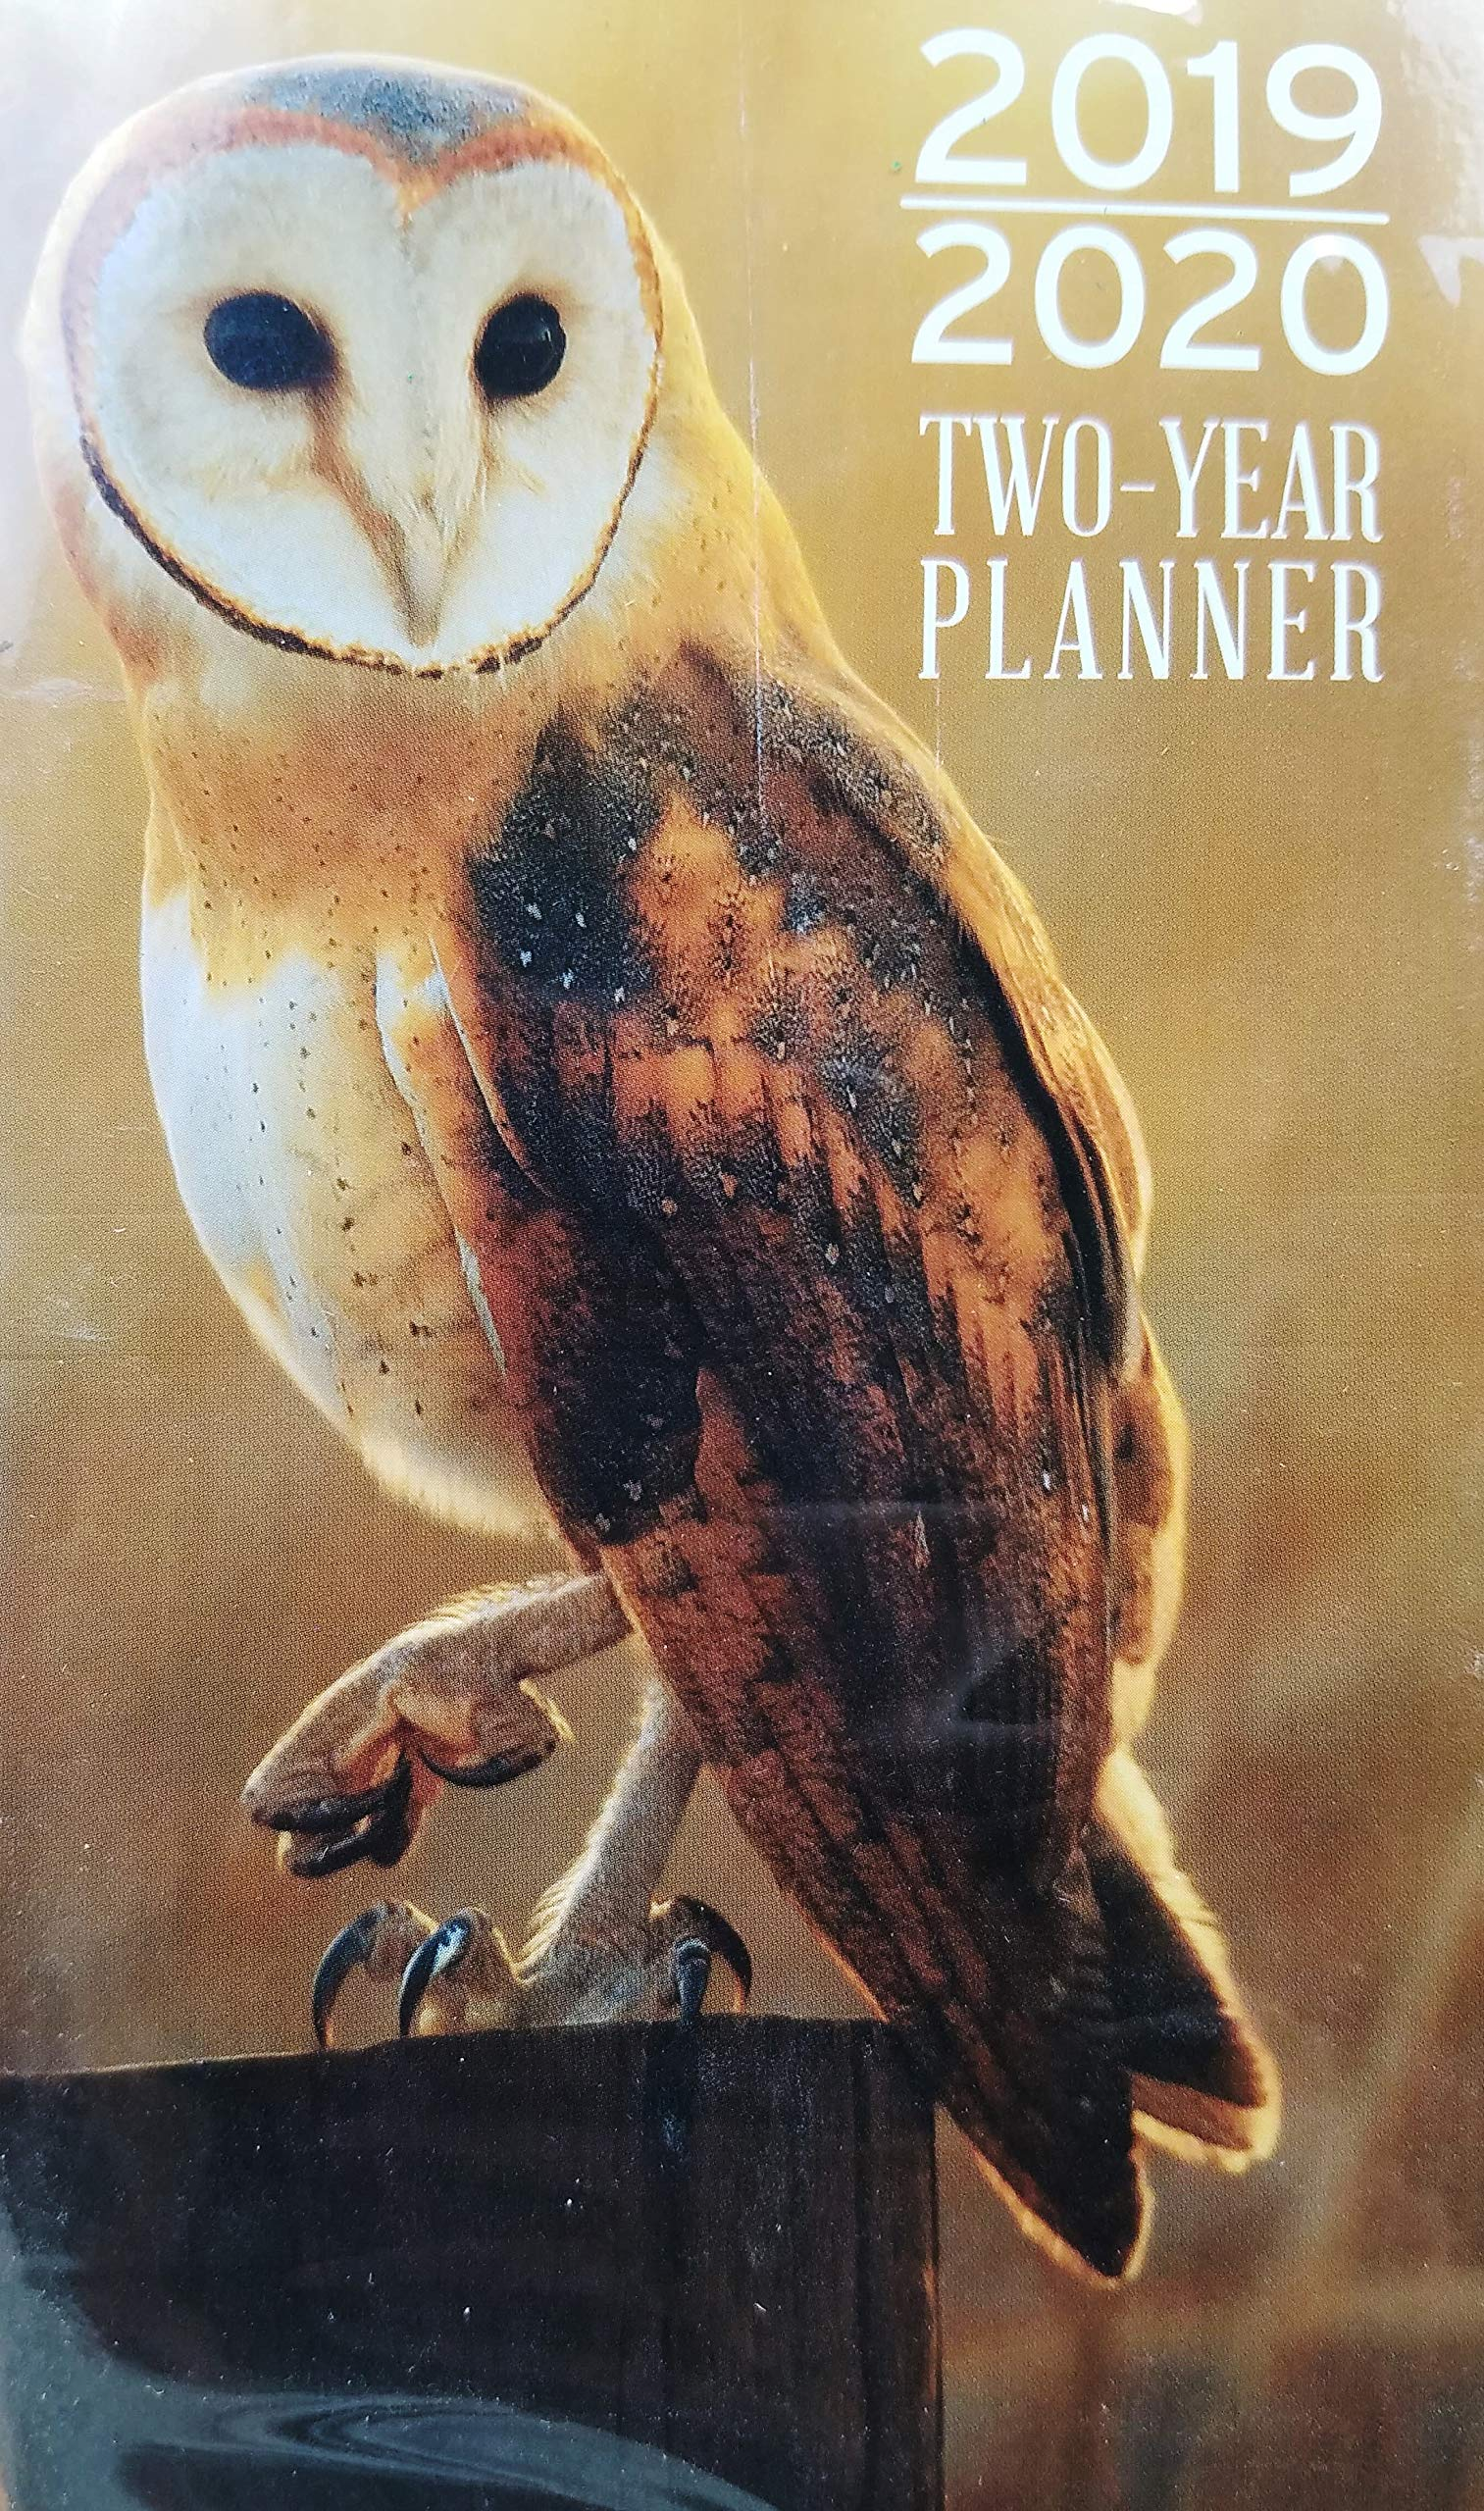 Owl 2019-2020 2 Year Pocket Planner